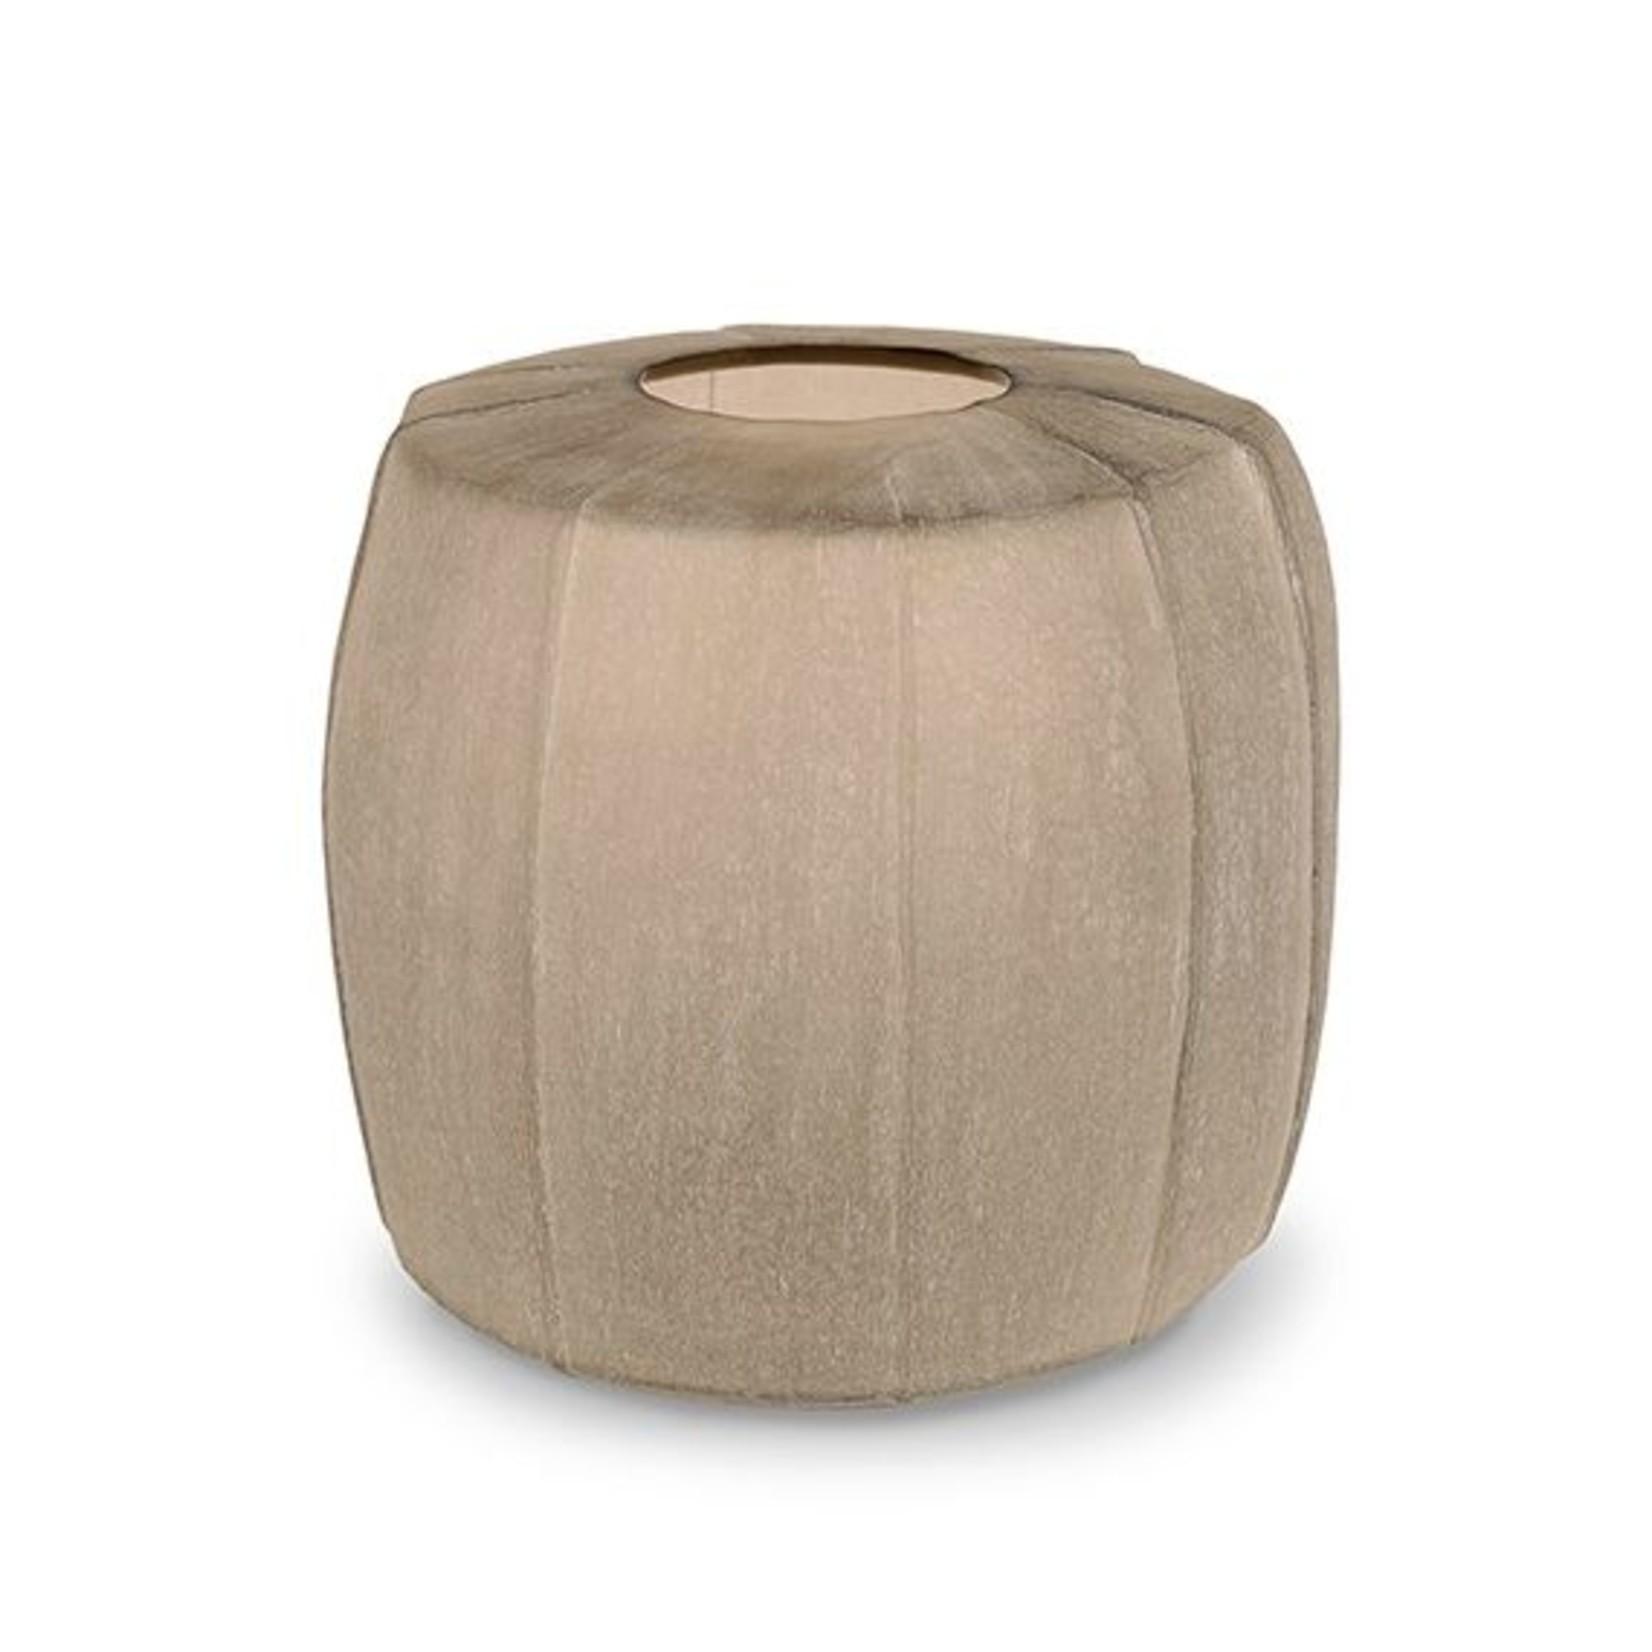 Guaxs Vase Tamatav Round | Smokegrey